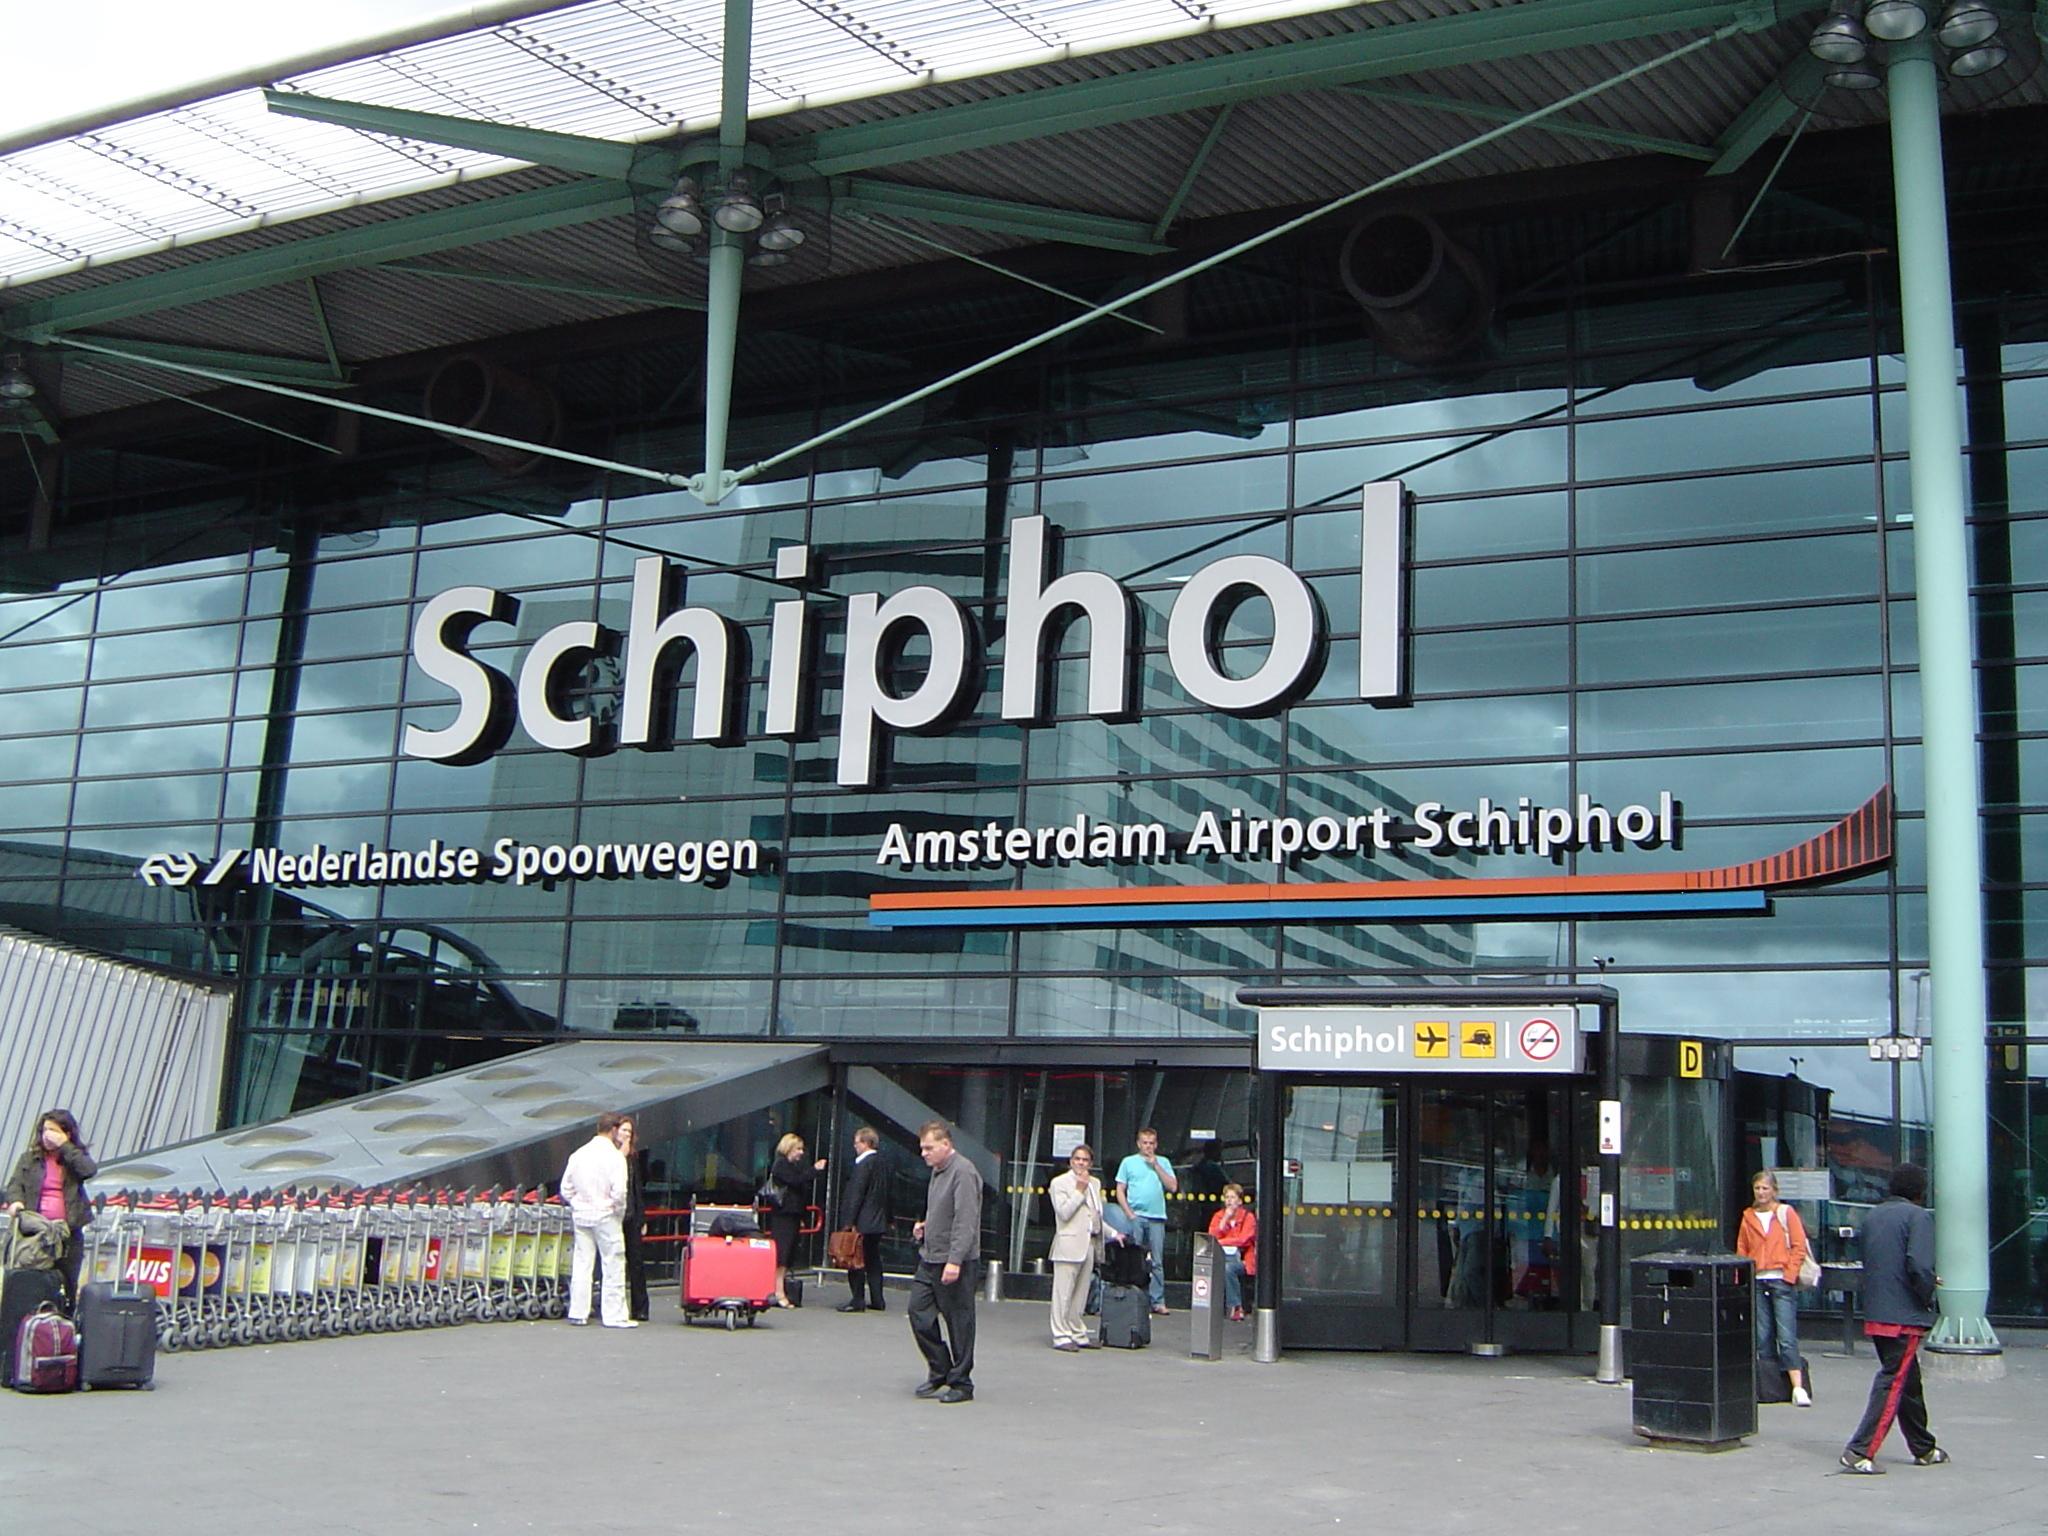 Schiphol Airport.